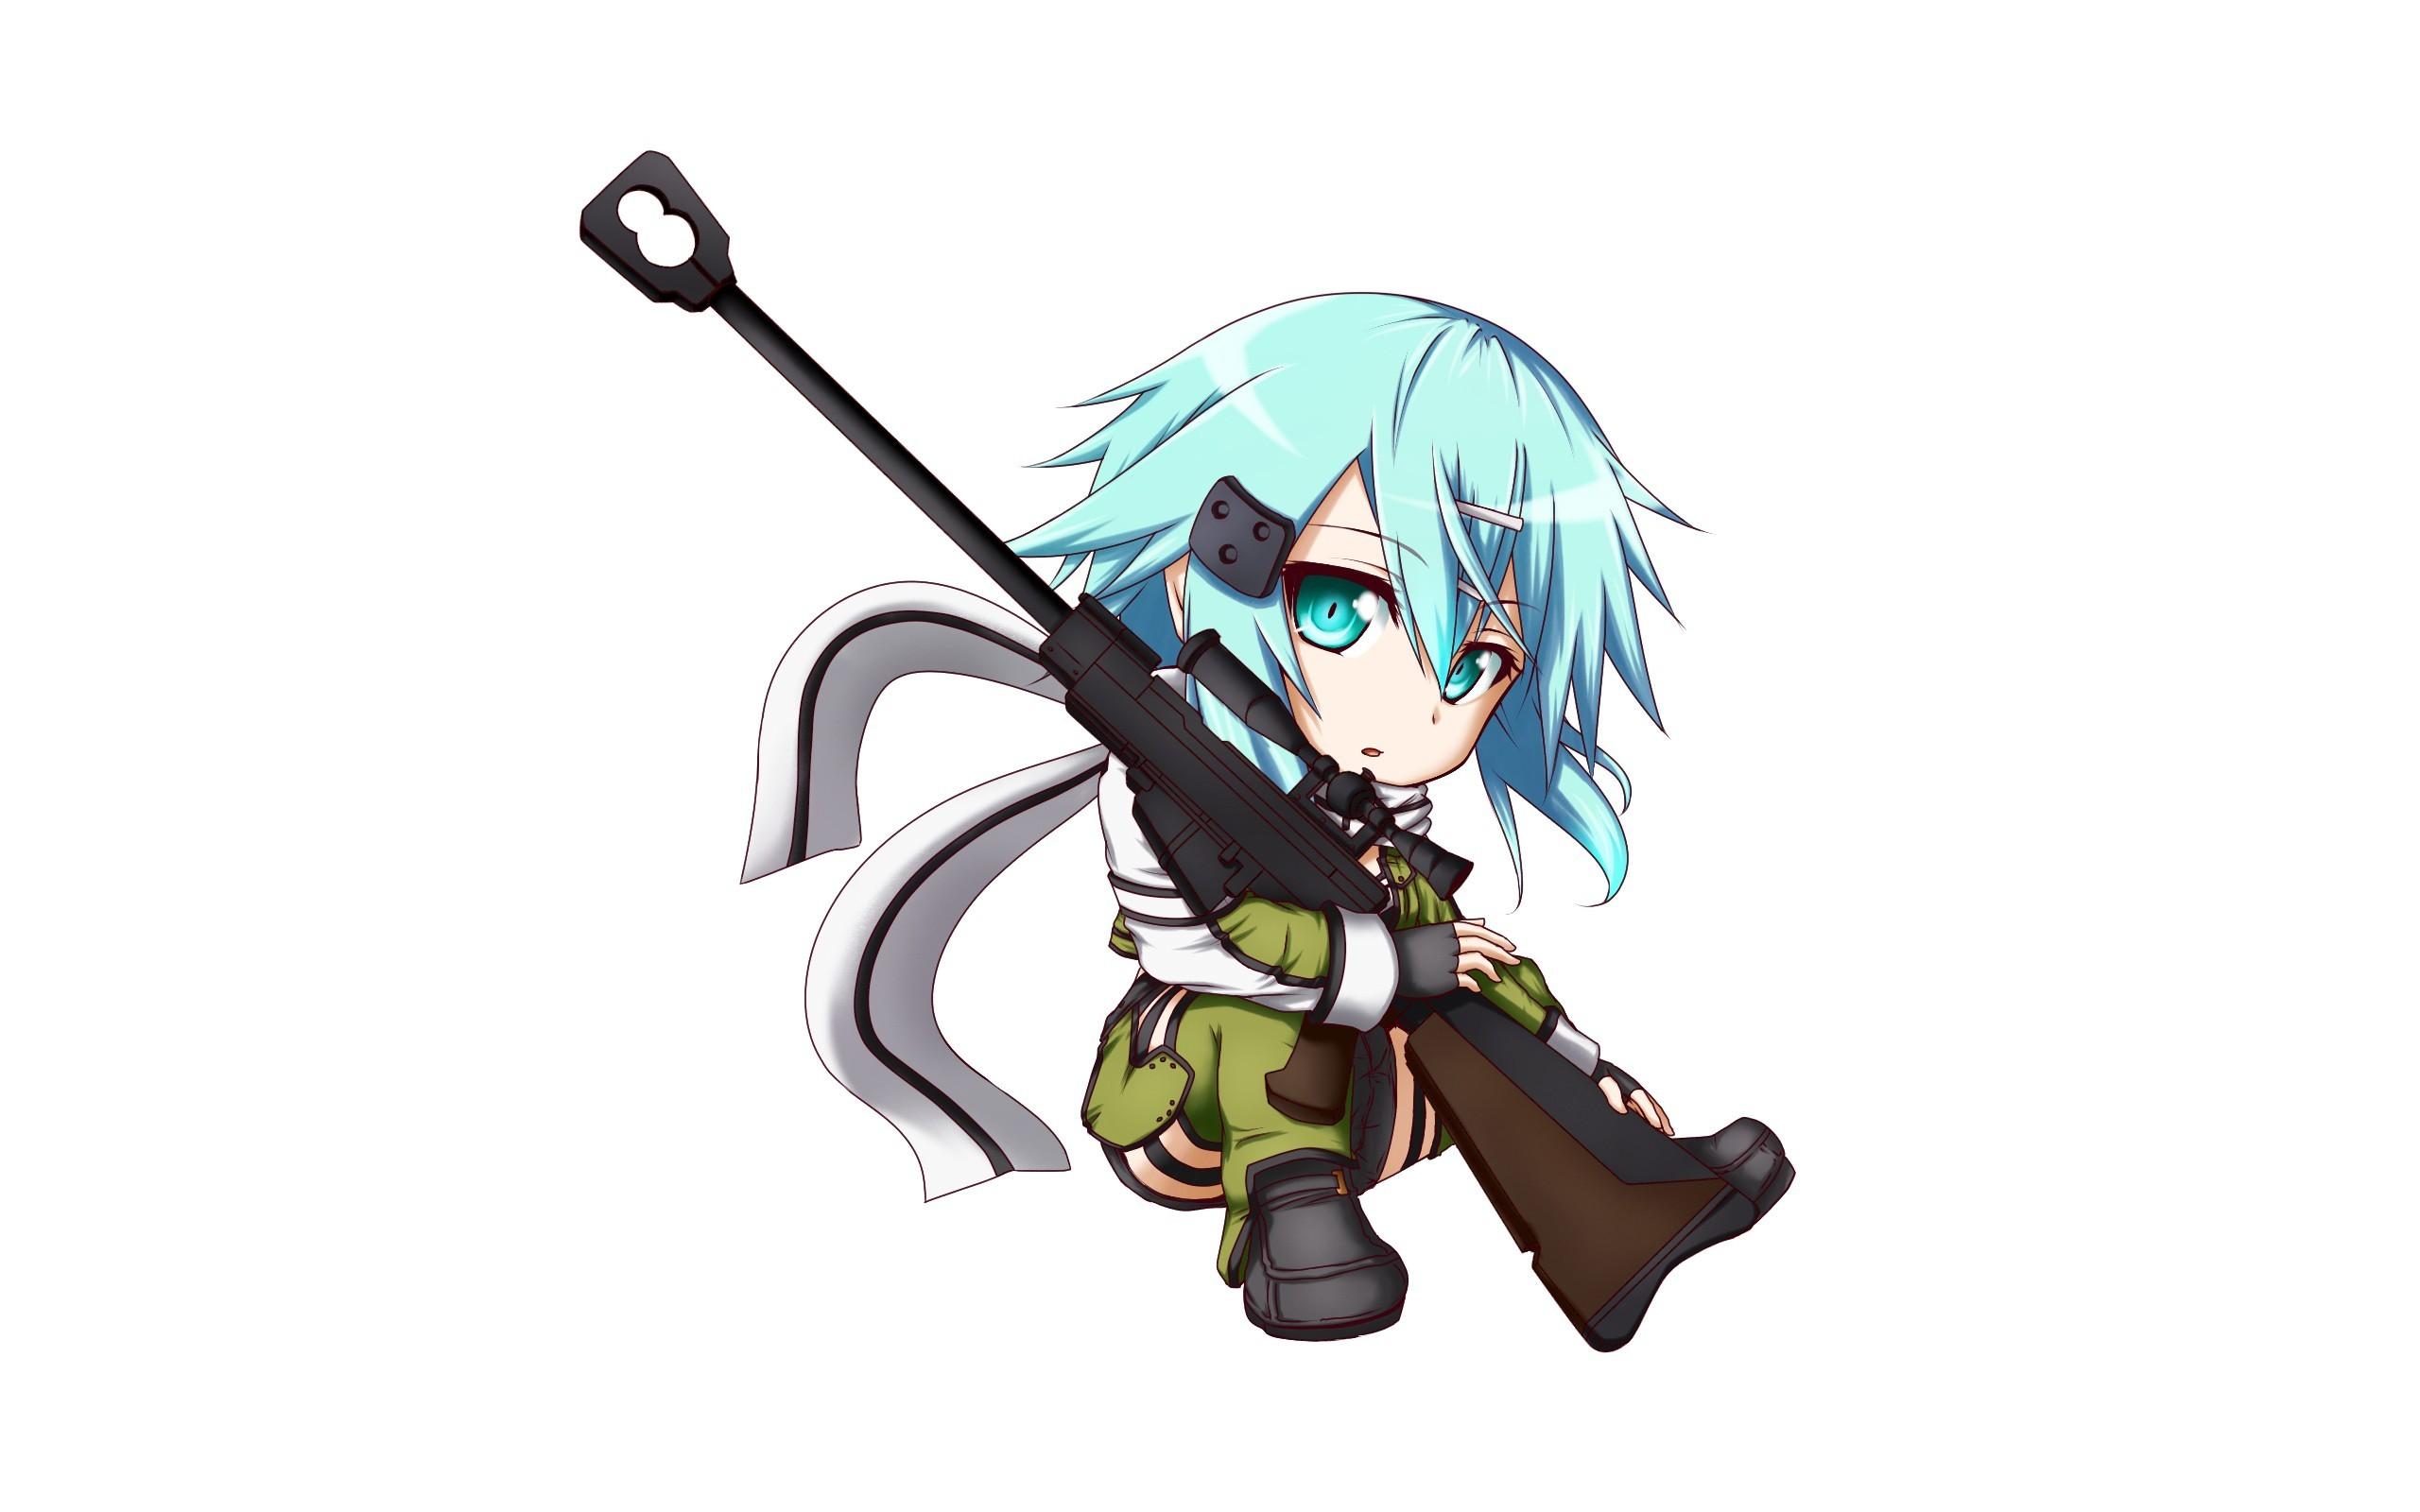 Download Wallpaper Game Anime Chibi Pretty Sniper Asian Rifle